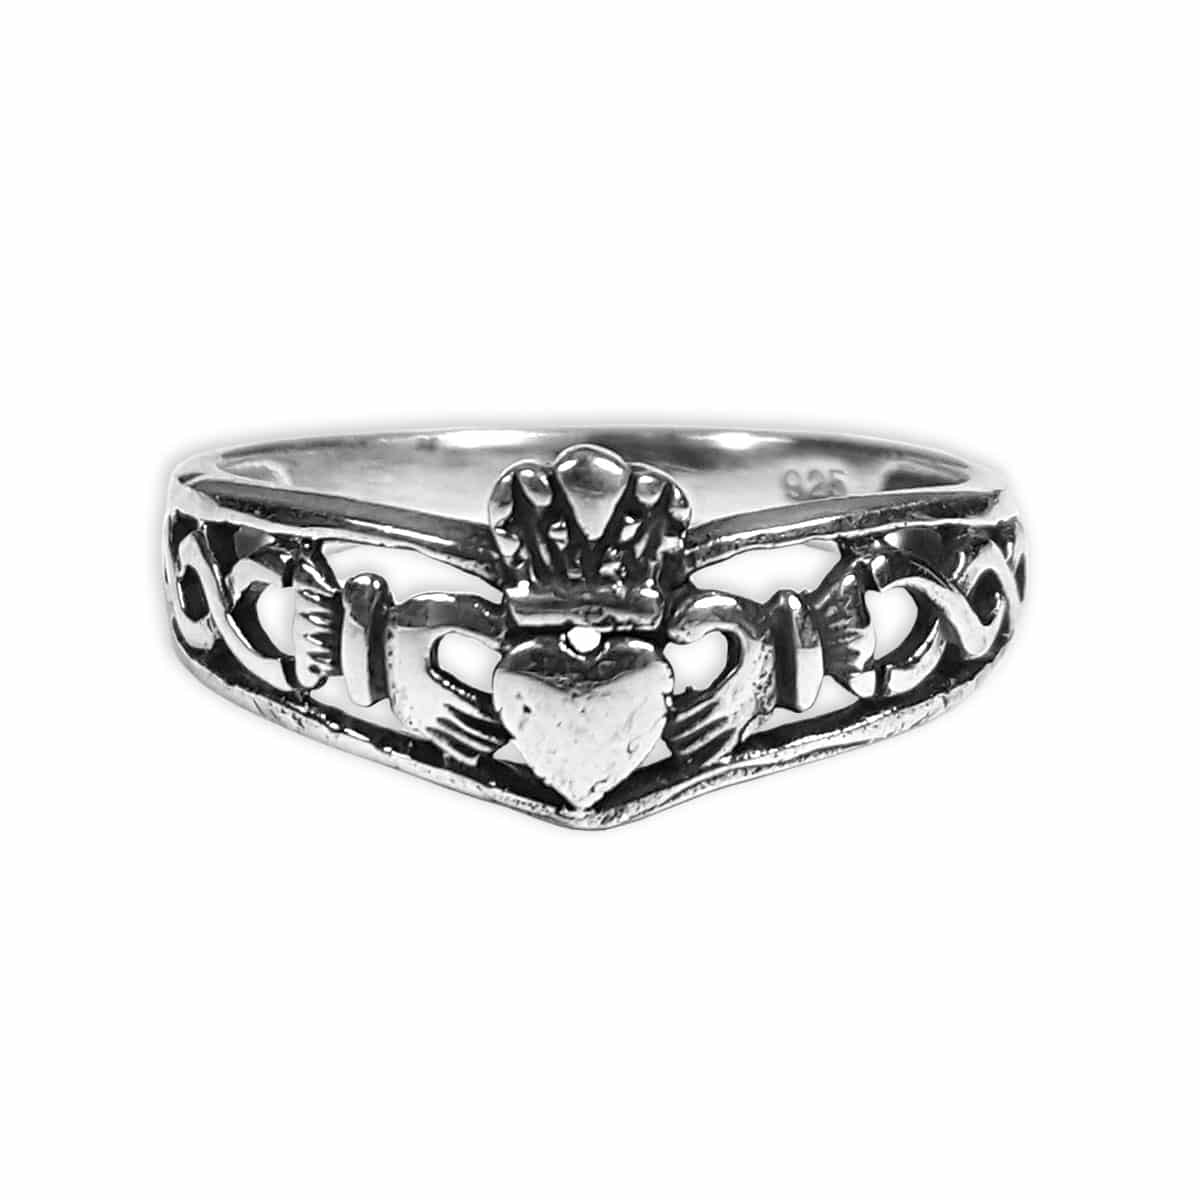 Silver Claddagh Celtic Knot Ring Kilts N Stuff Com